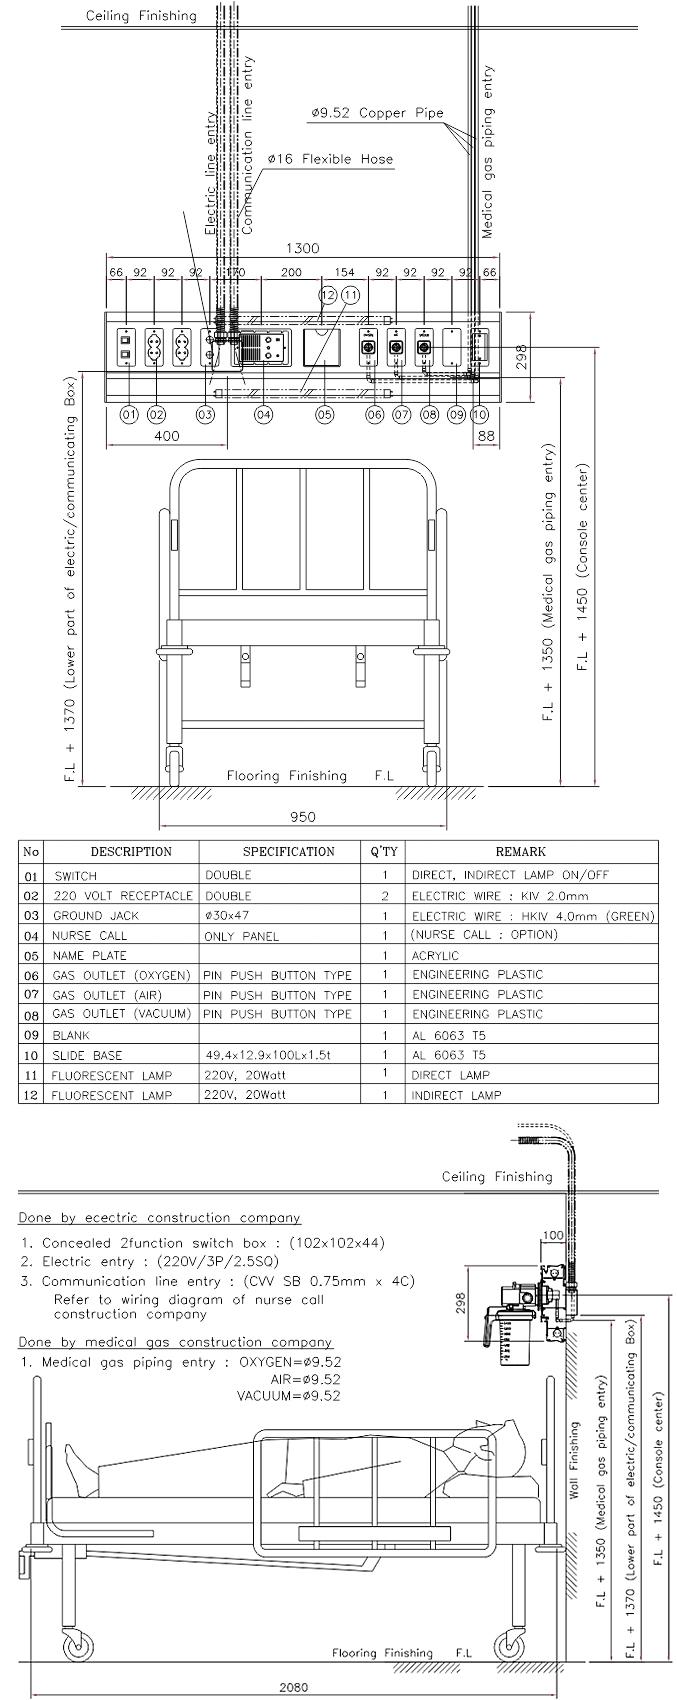 Deluxe Console System Medimaxkorea Co Ltd - Wiring diagram nurse call system